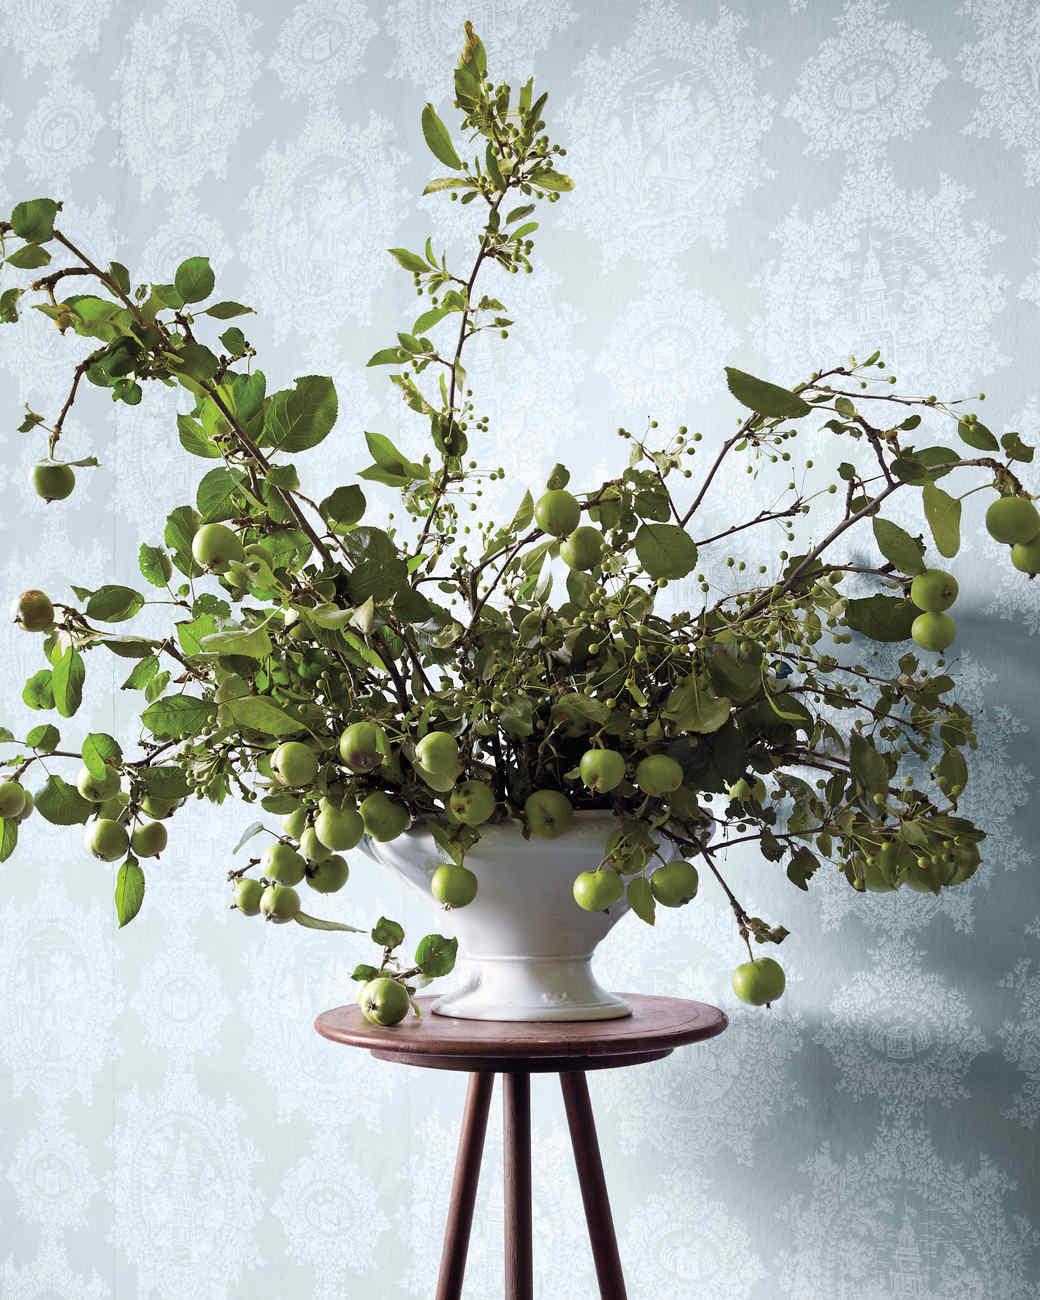 branches-arrangement-085-d110446-r.jpg